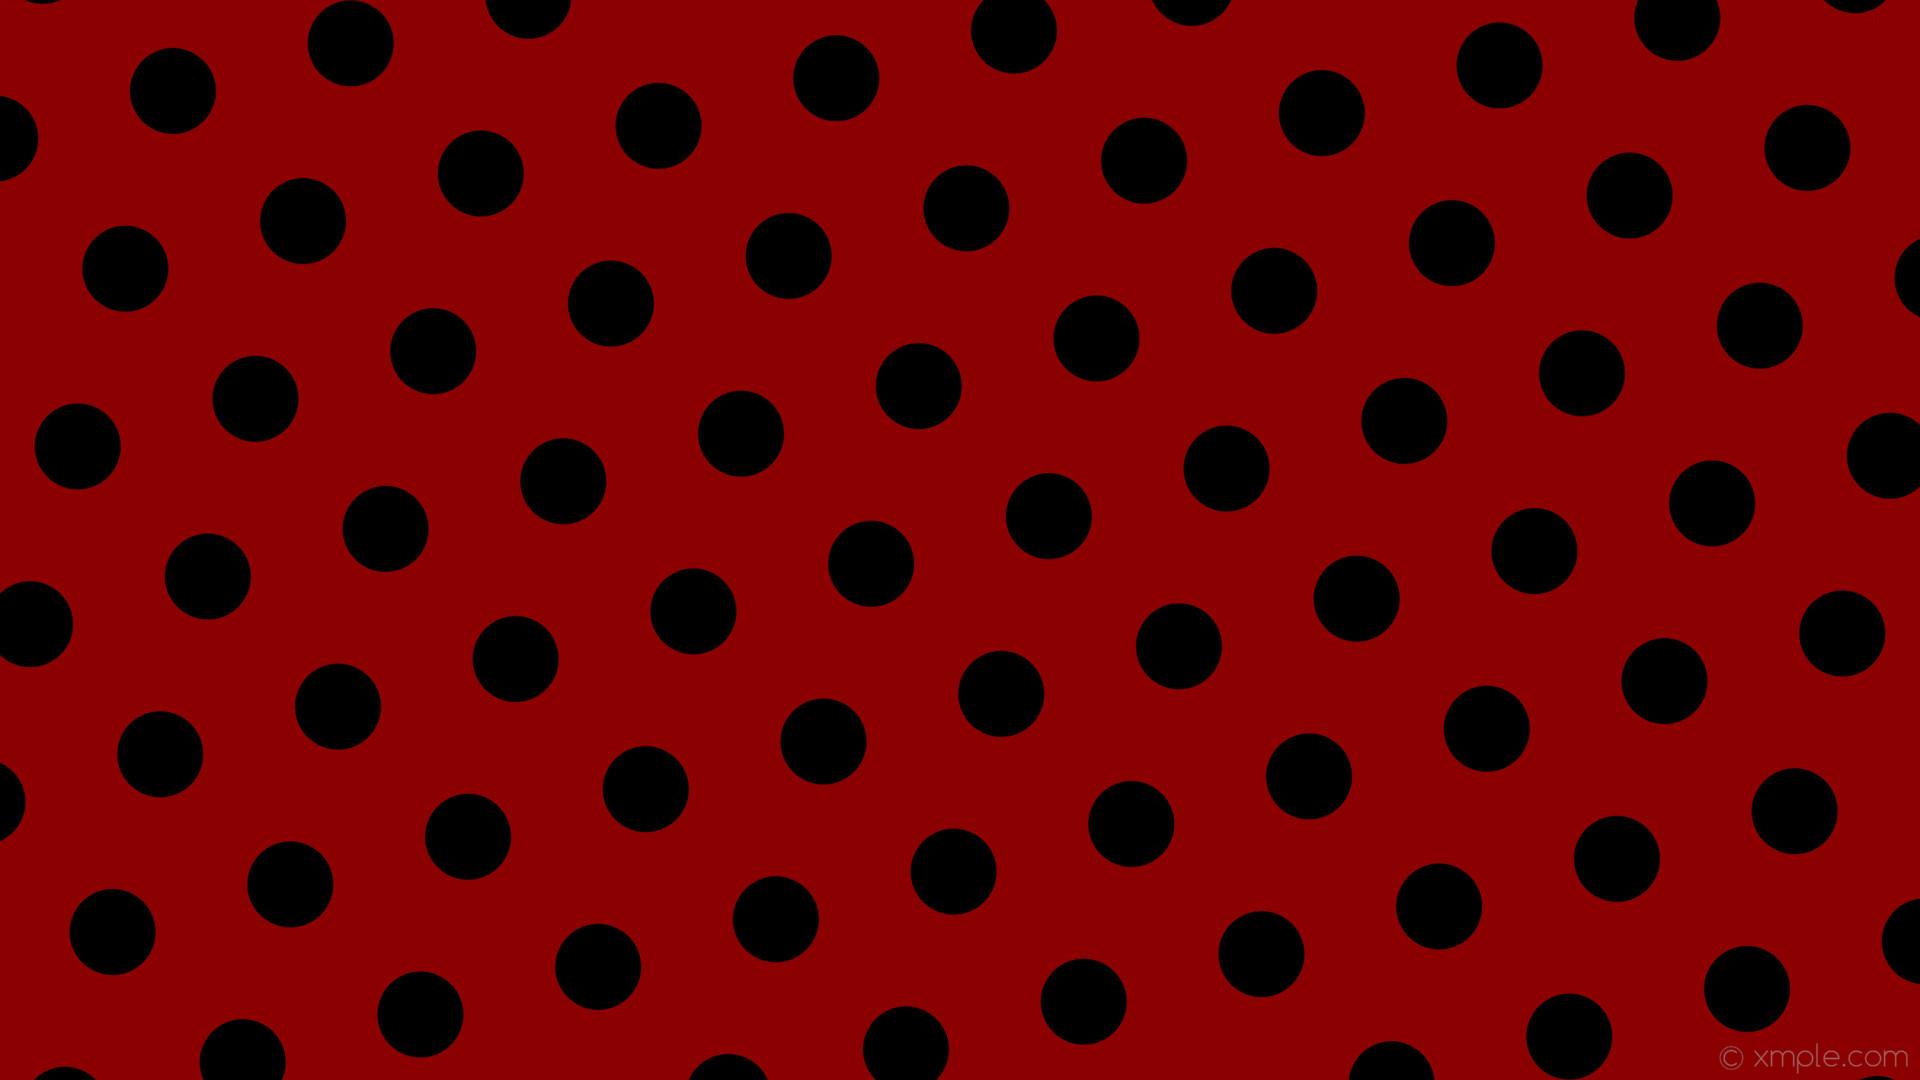 wallpaper black polka dots hexagon red dark red #8b0000 #000000 diagonal  15° 86px